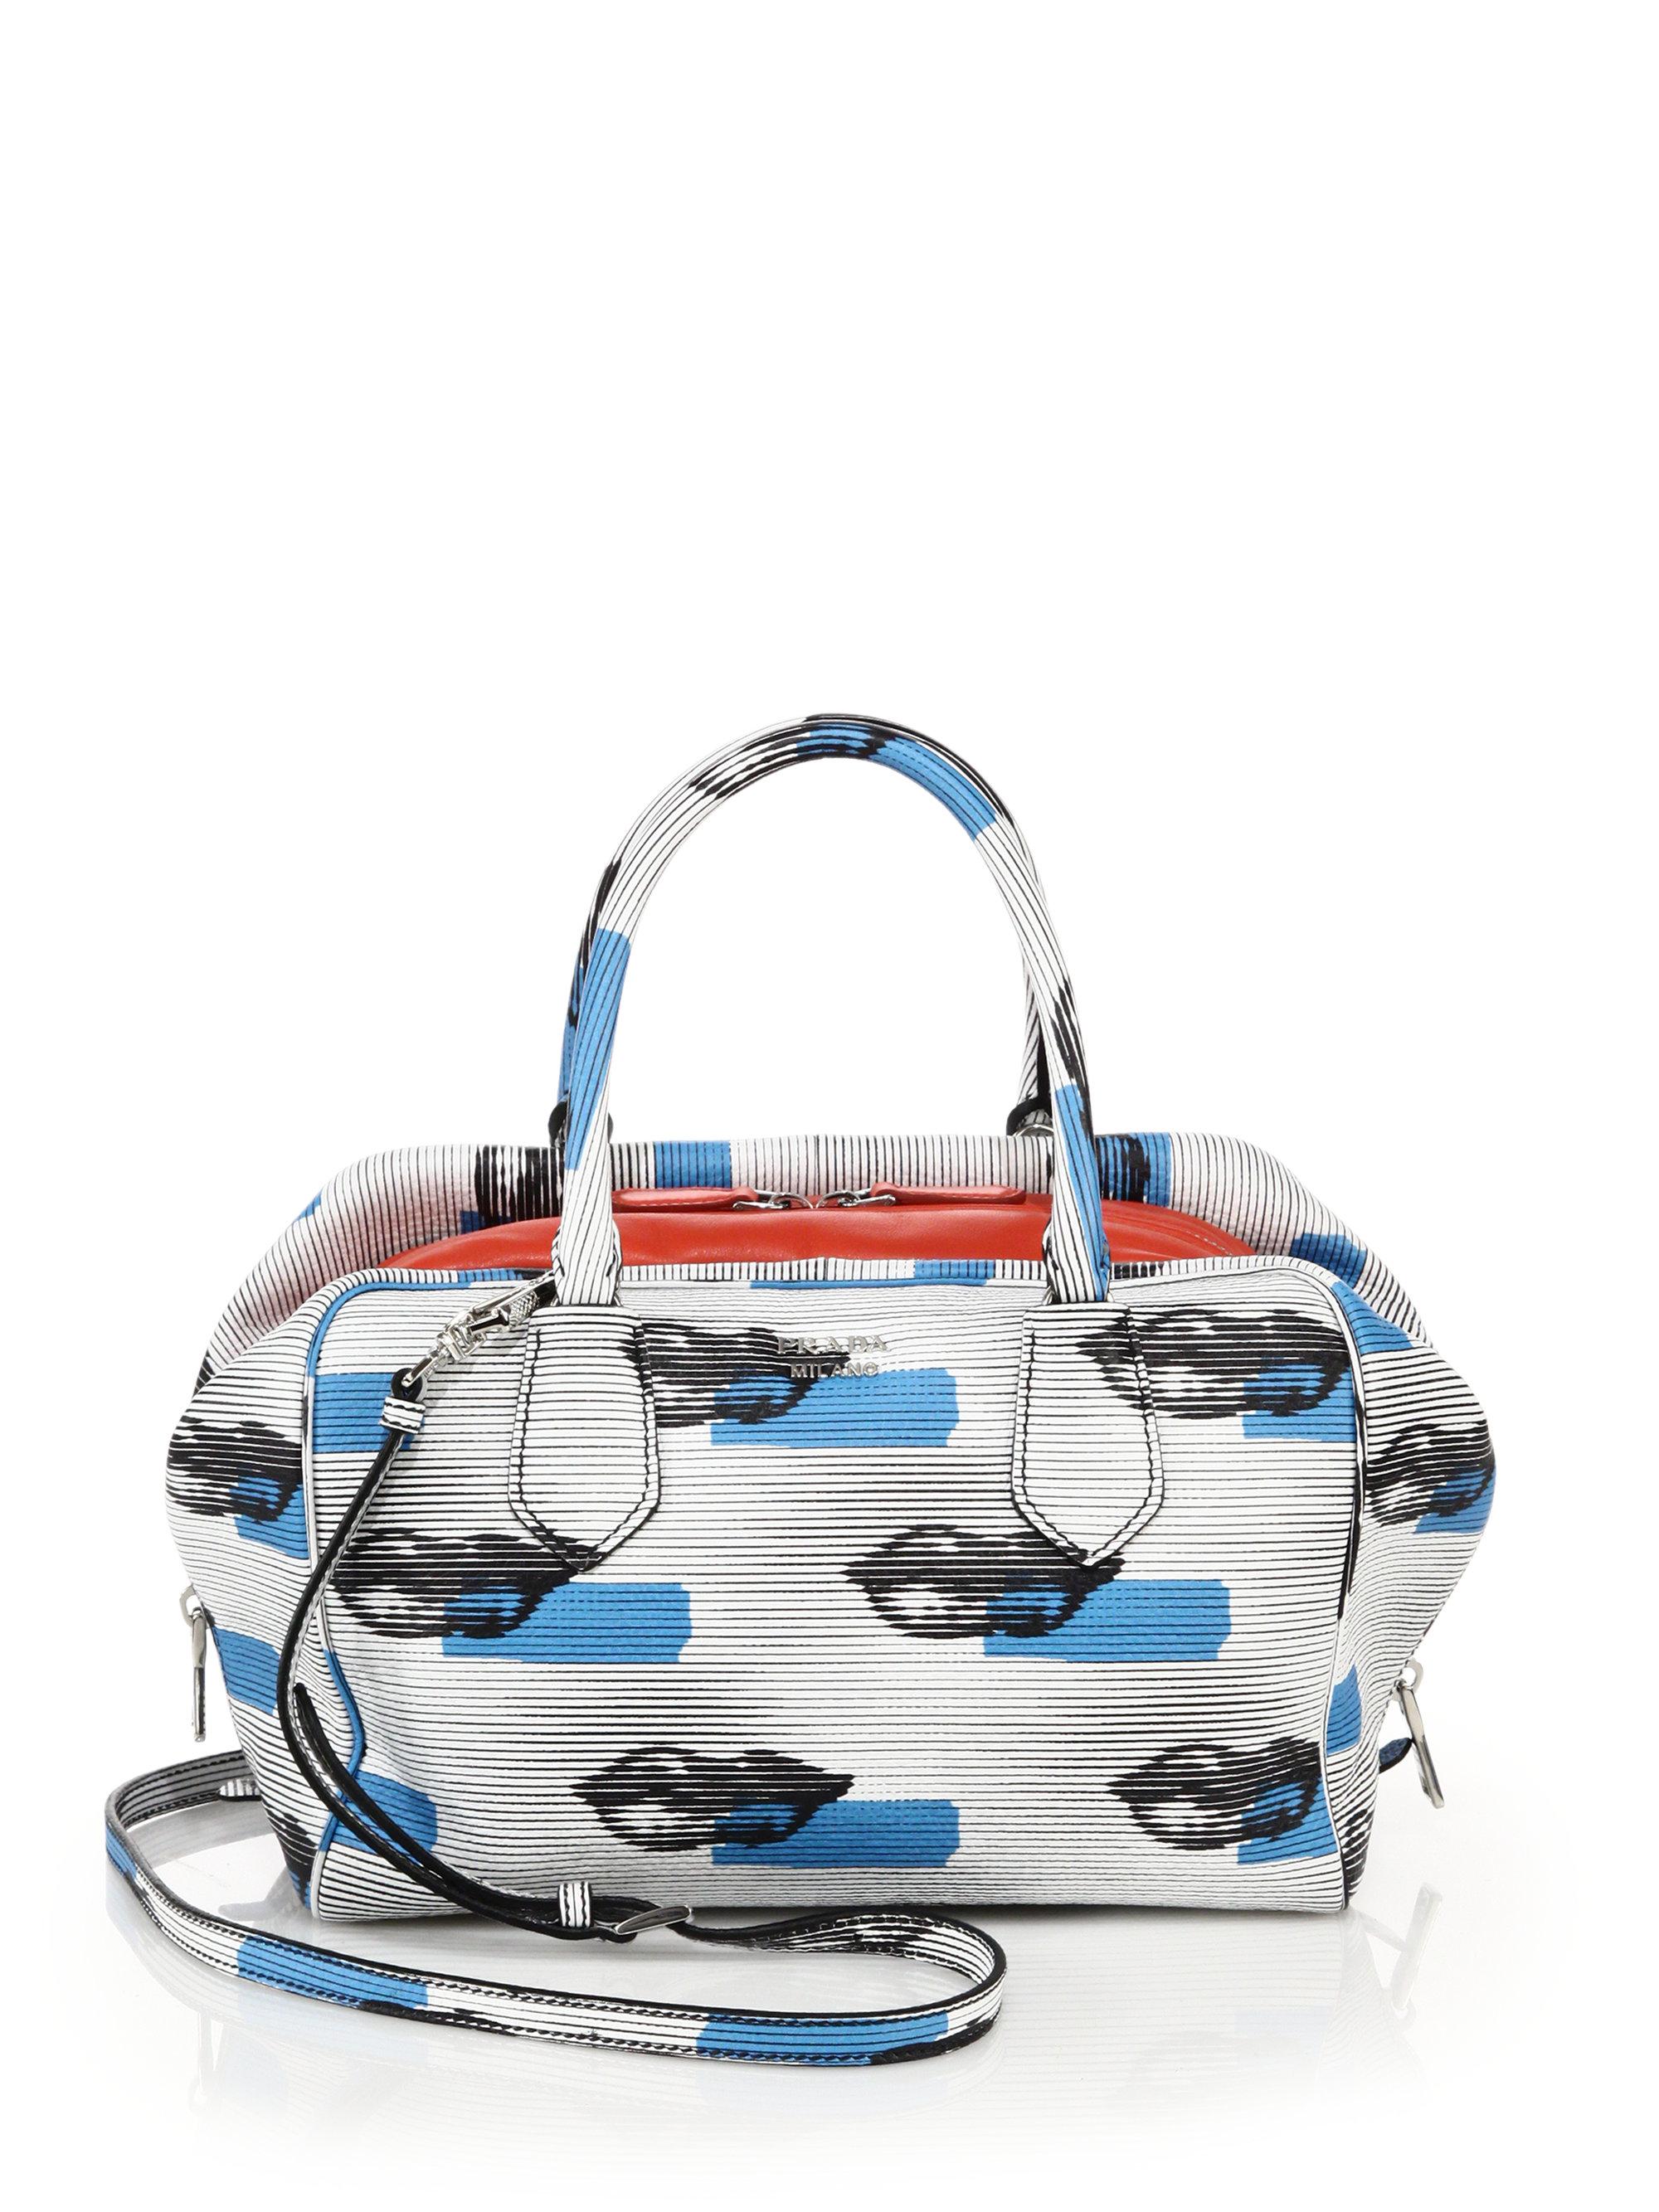 Prada Lip-print Leather Inside Bag in White (white-blue) | Lyst